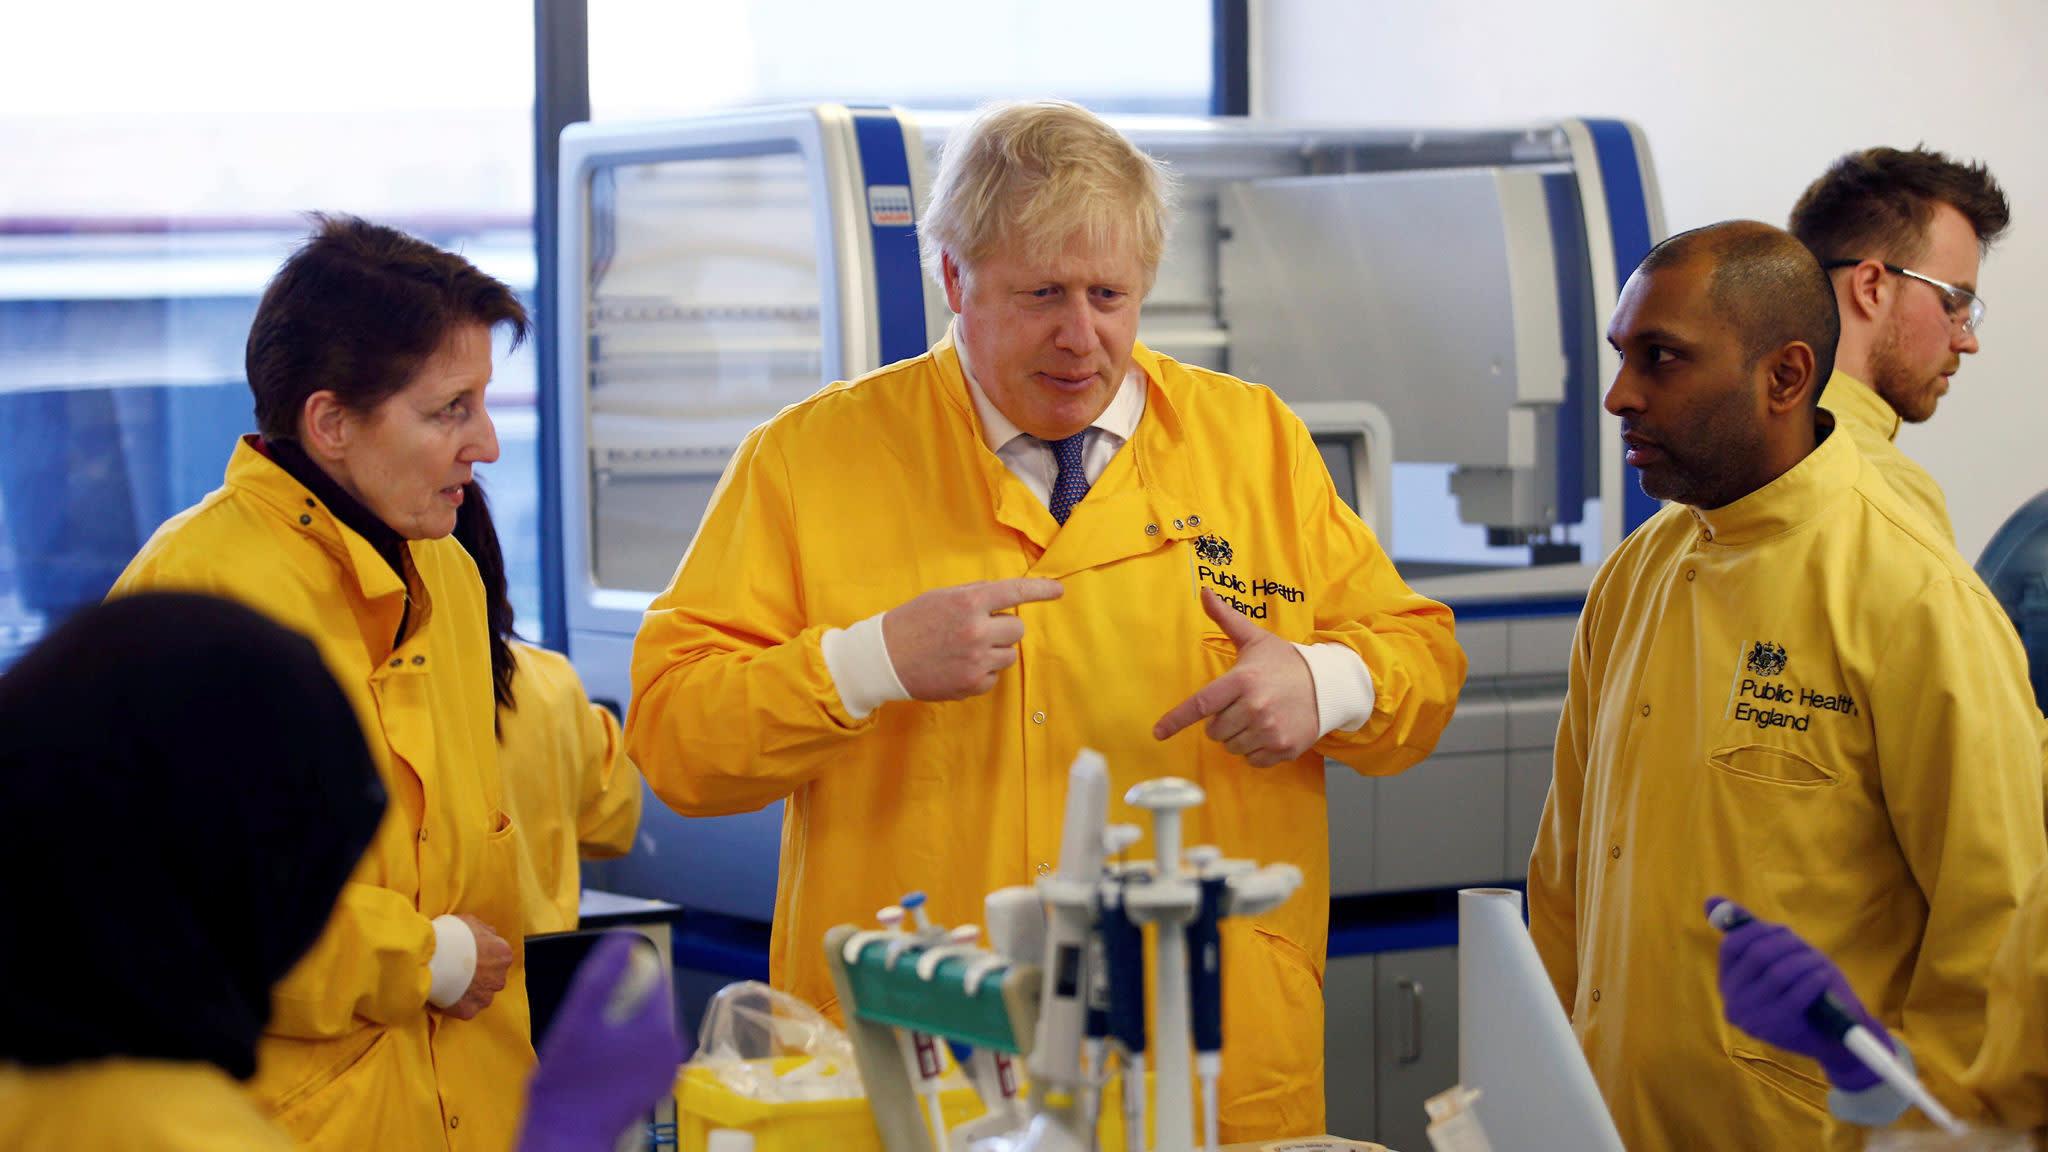 Coronavirus latest: UK to help other countries spot new virus variants